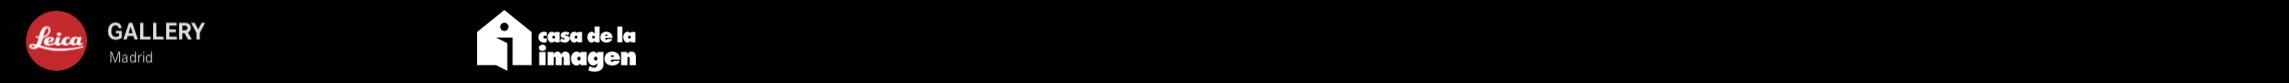 logos-negro-1